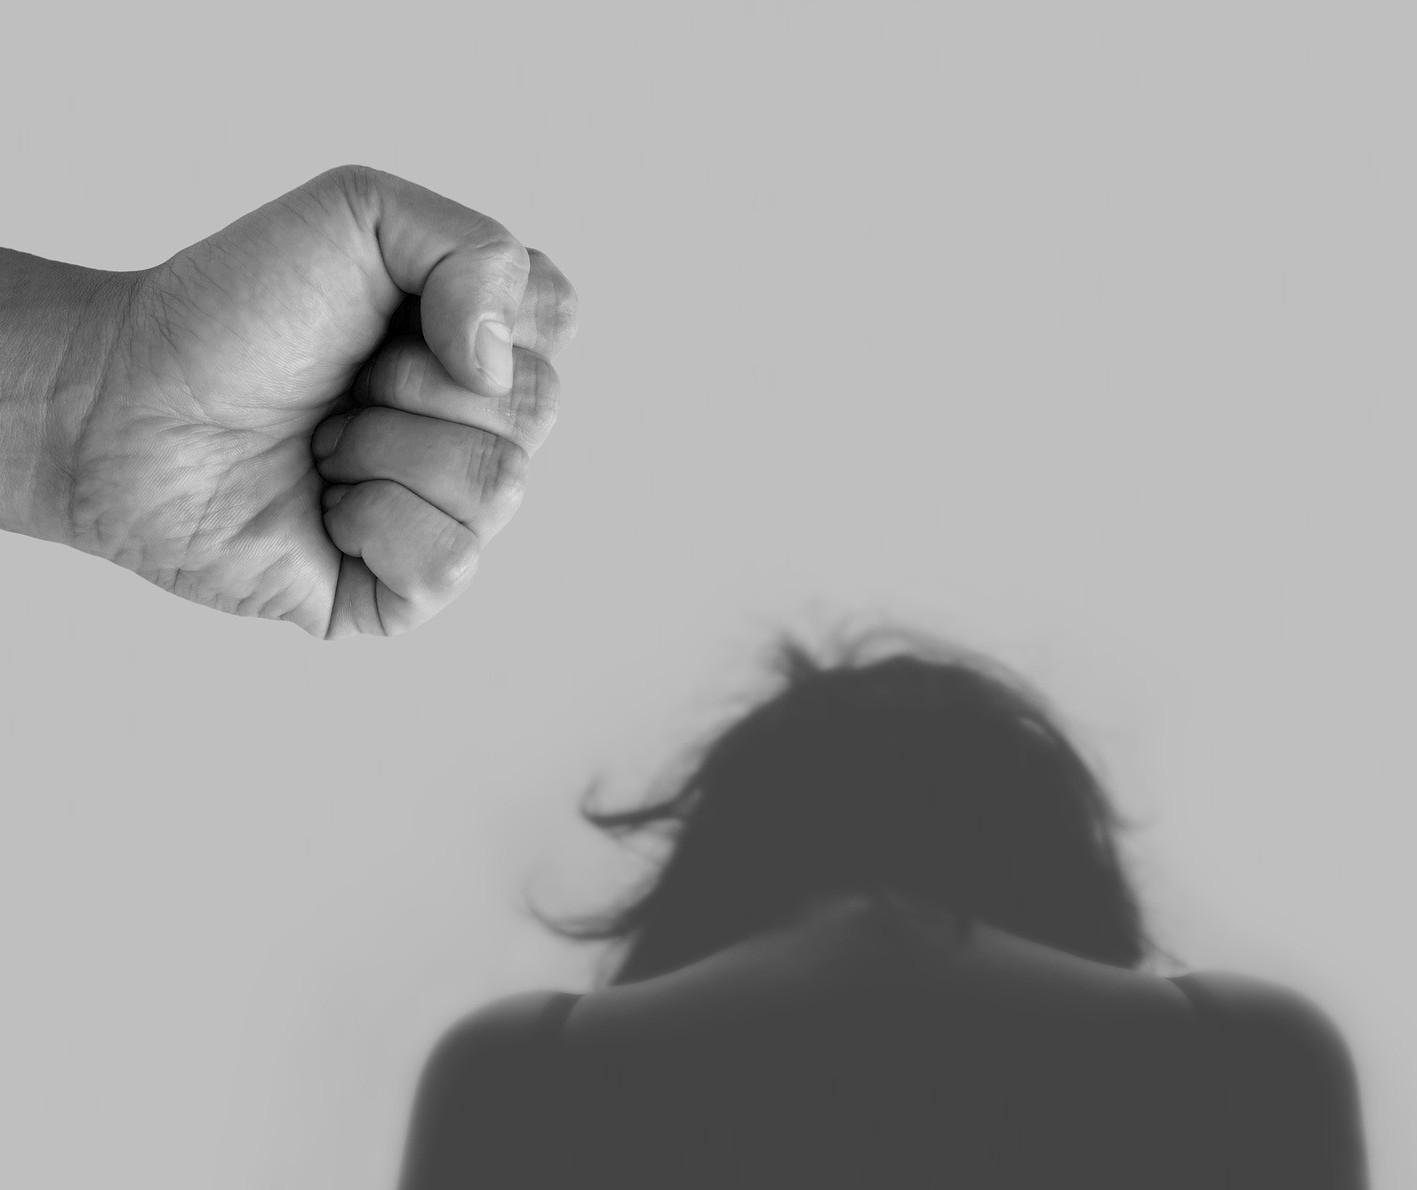 Pandemia traz à tona grandes polêmicas, entre elas a violência doméstica